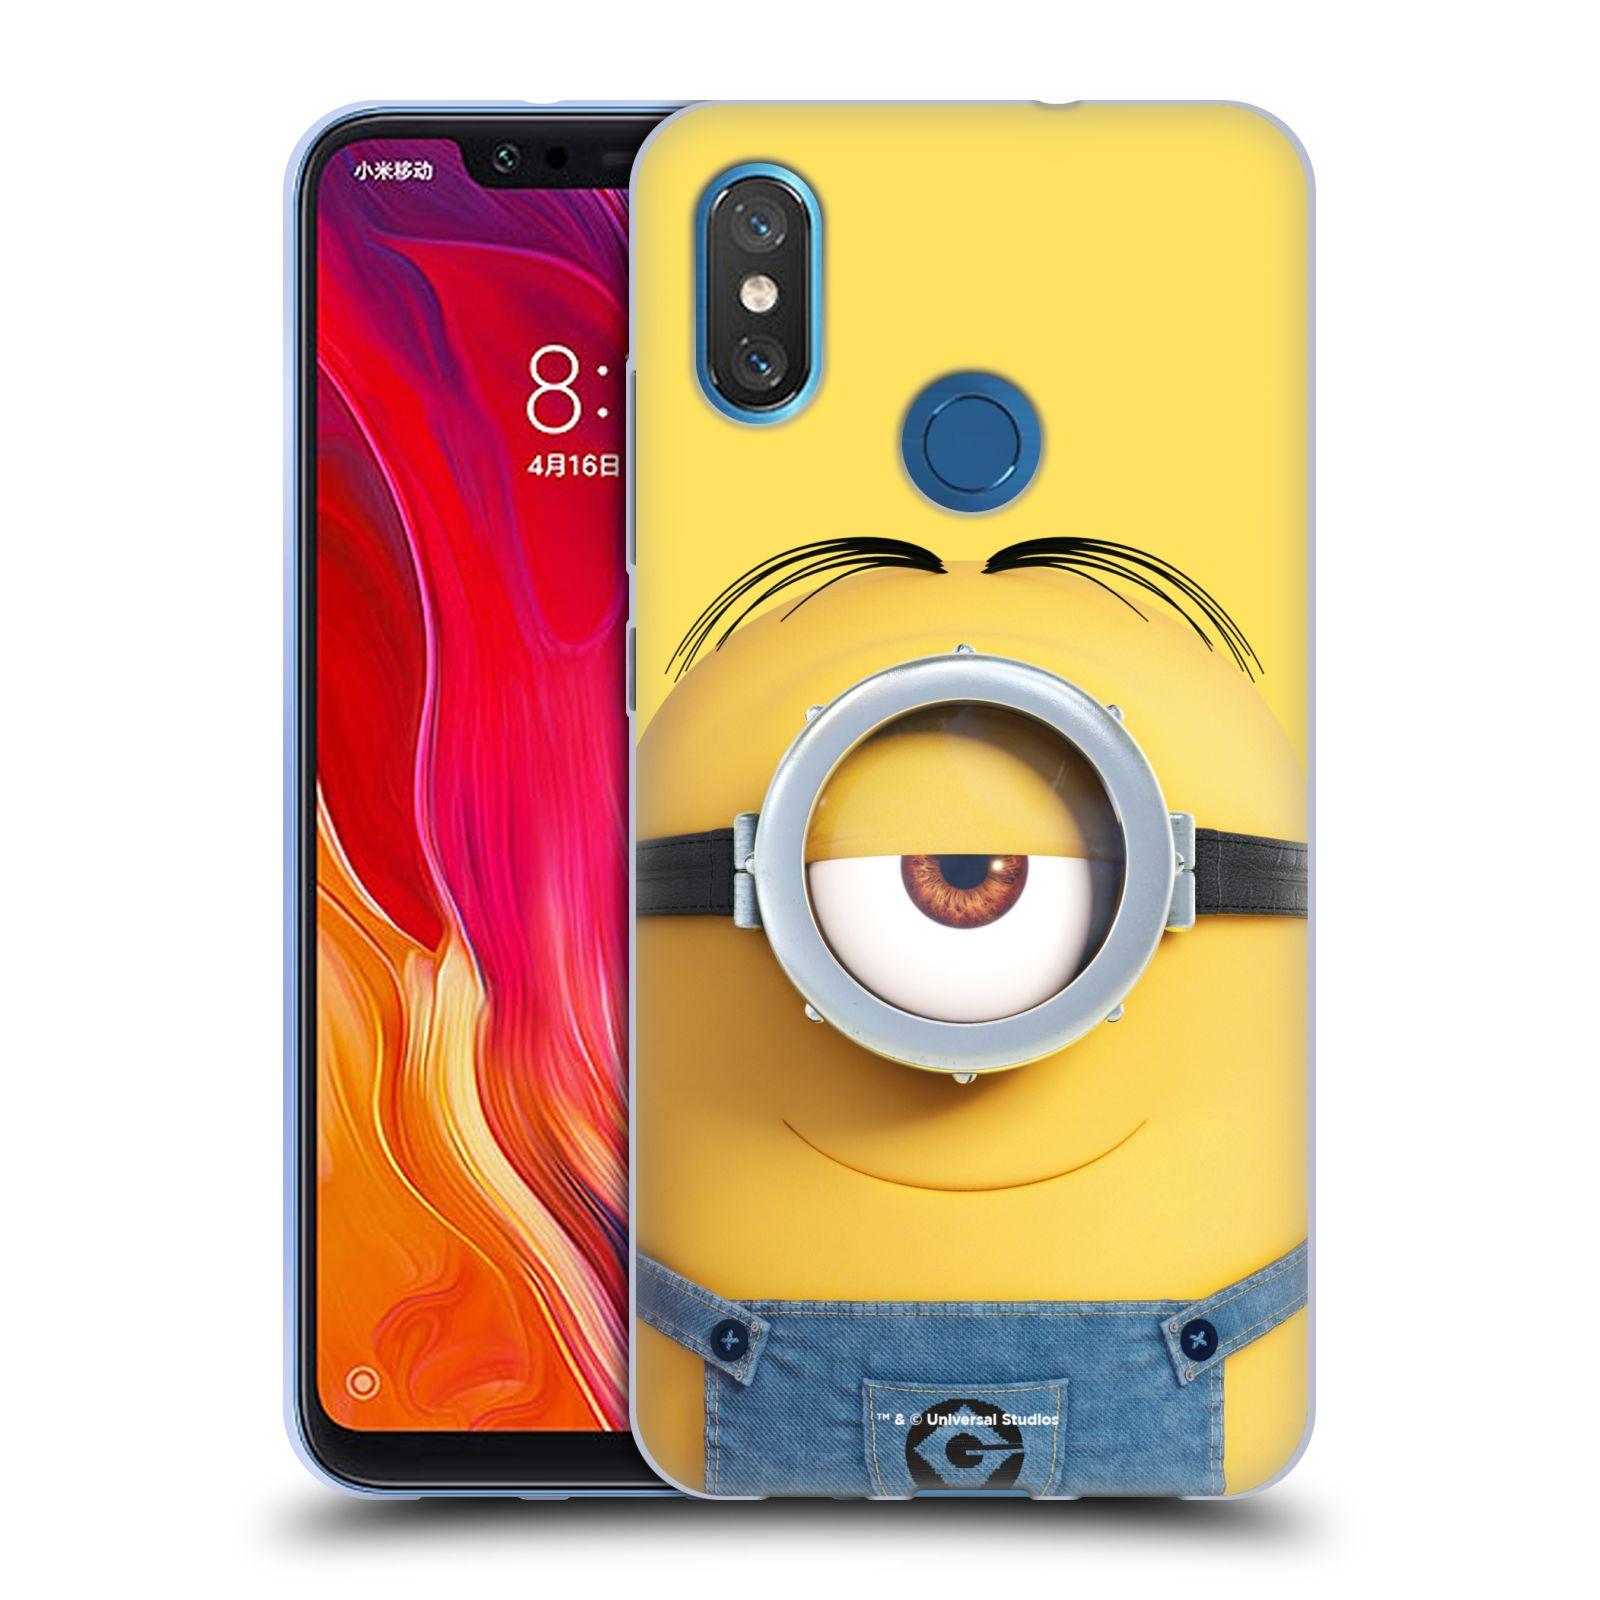 Silikonové pouzdro na mobil Xiaomi Mi8 - Head Case - Mimoň Stuart z filmu Já, padouch - Despicable Me